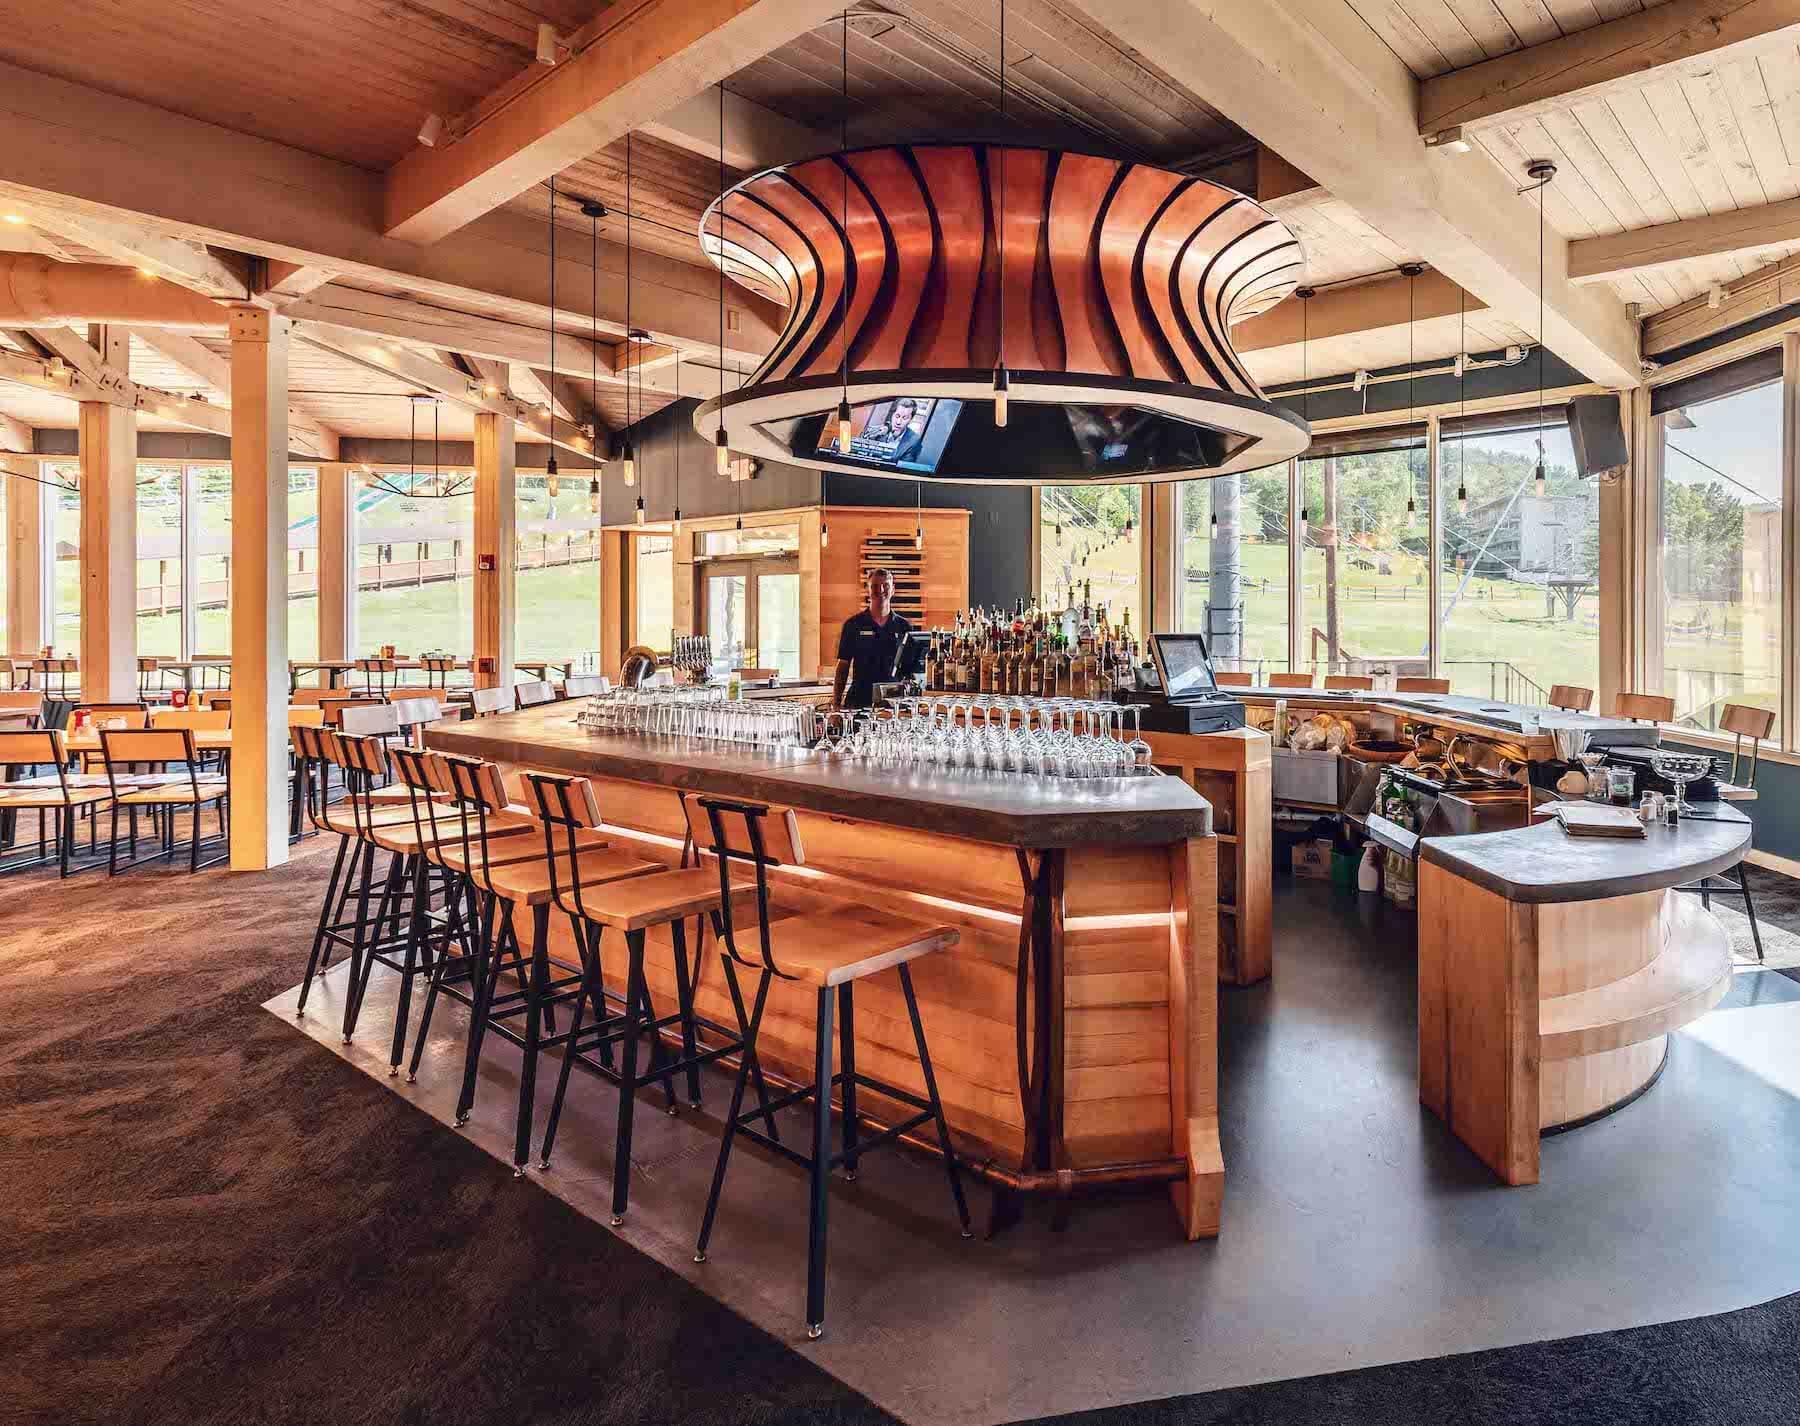 Copper Kettle Bar